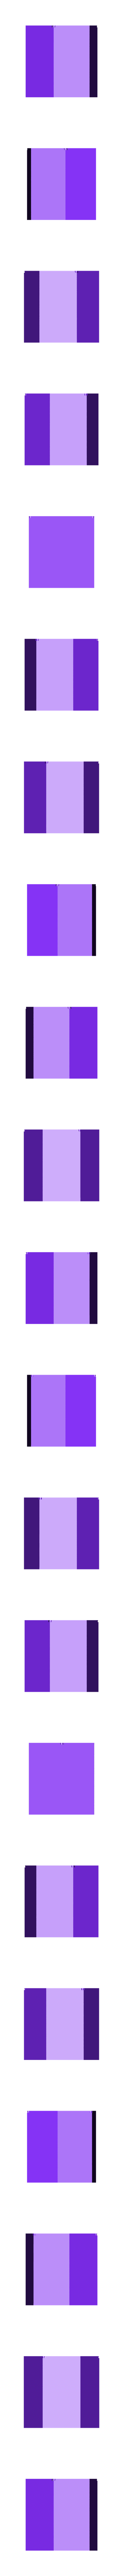 wall_mounting_module.stl Download free STL file Modular Hex Drawers • Design to 3D print, O3D